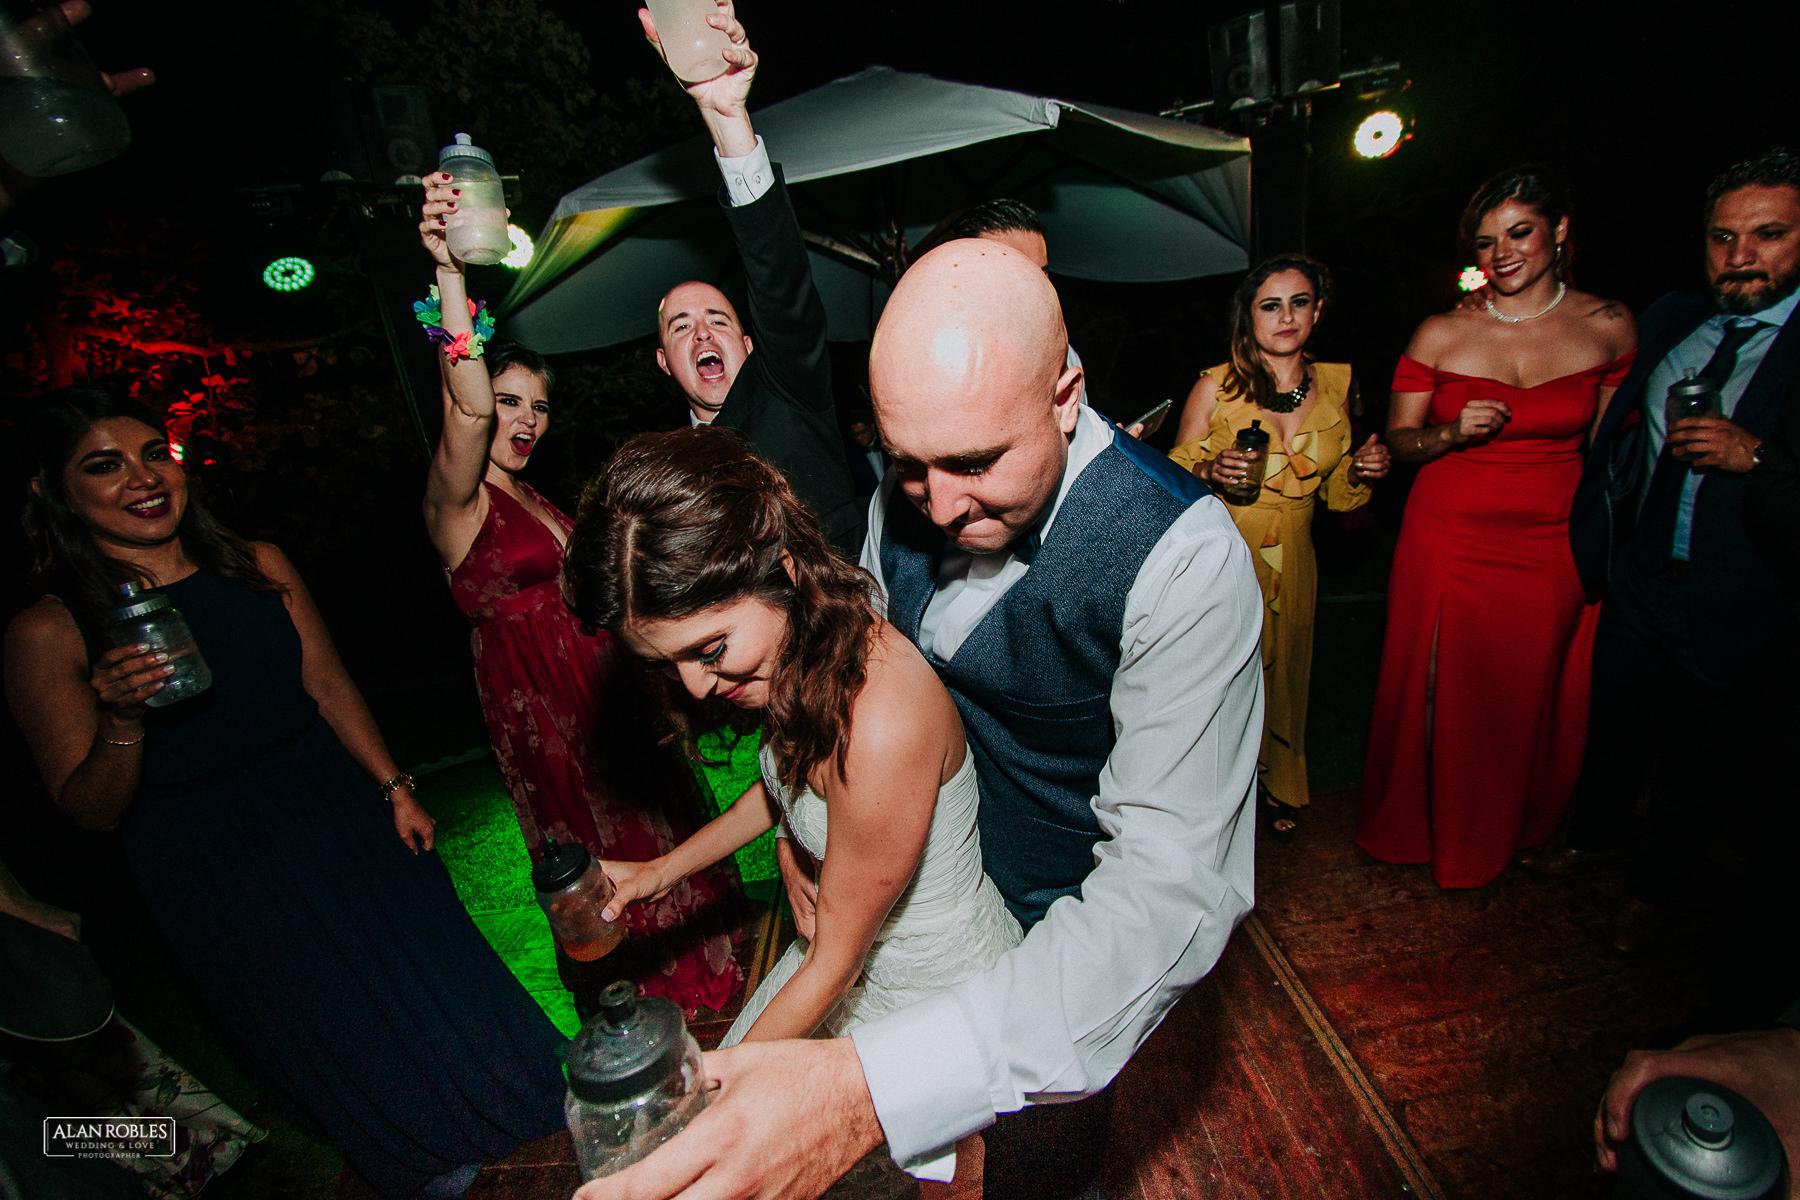 Fotografo de bodas guadalajara Alan Robles - Pinare terraza bistro 67